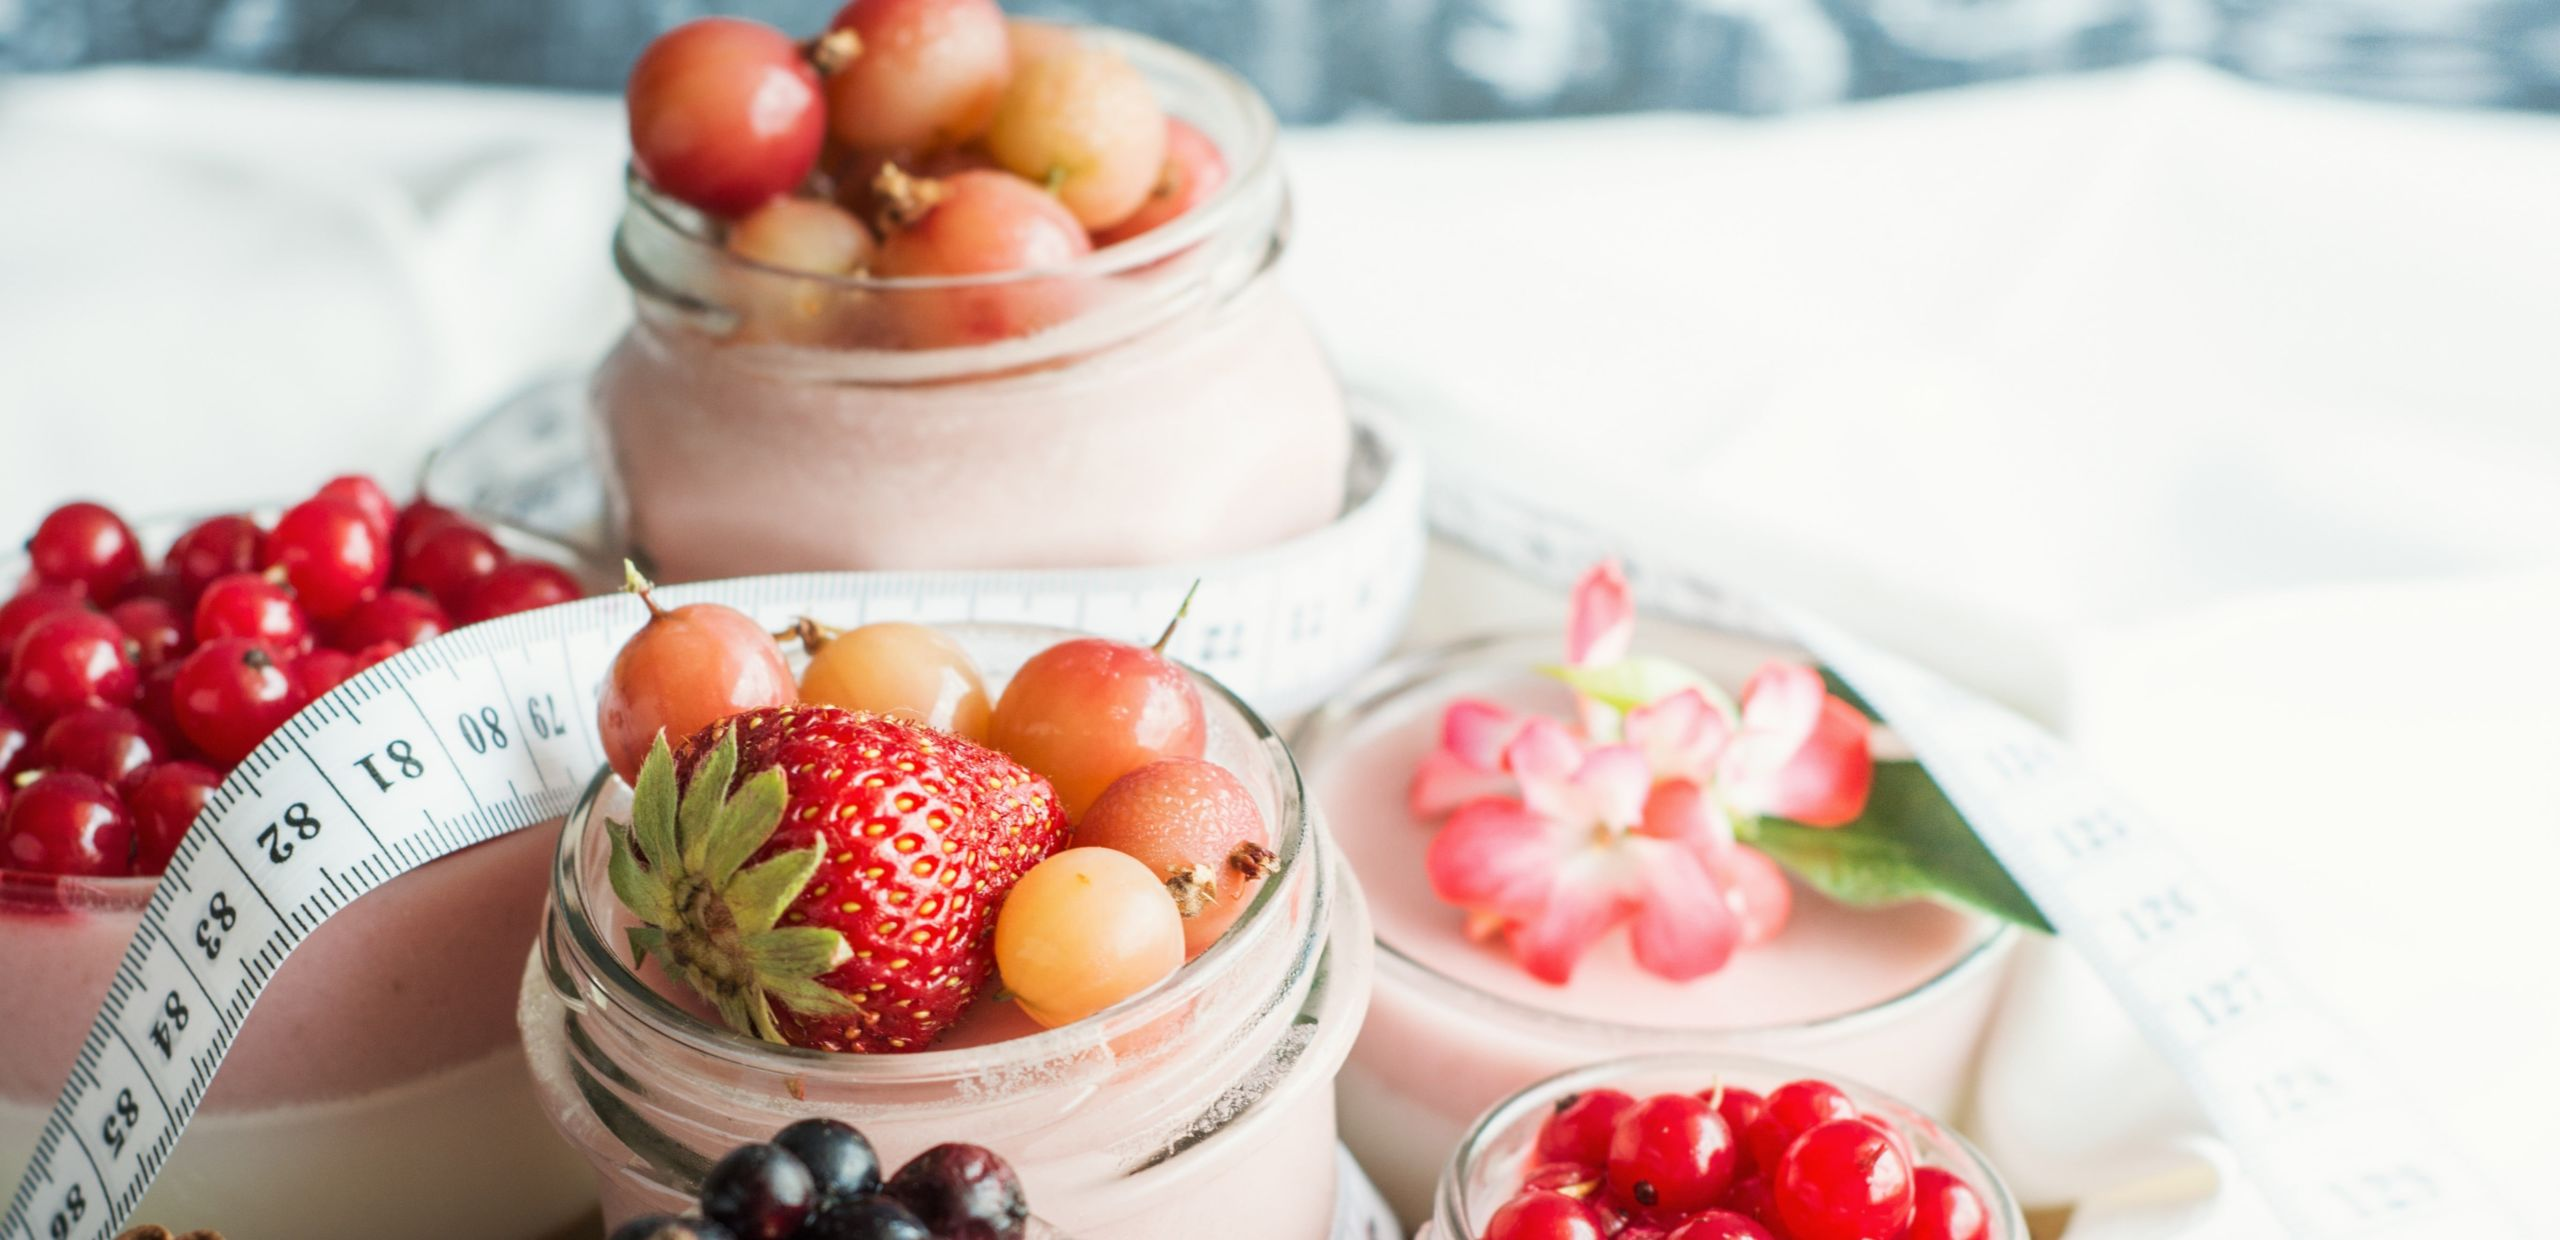 Esempi dieta ipocalorica con quante calorie